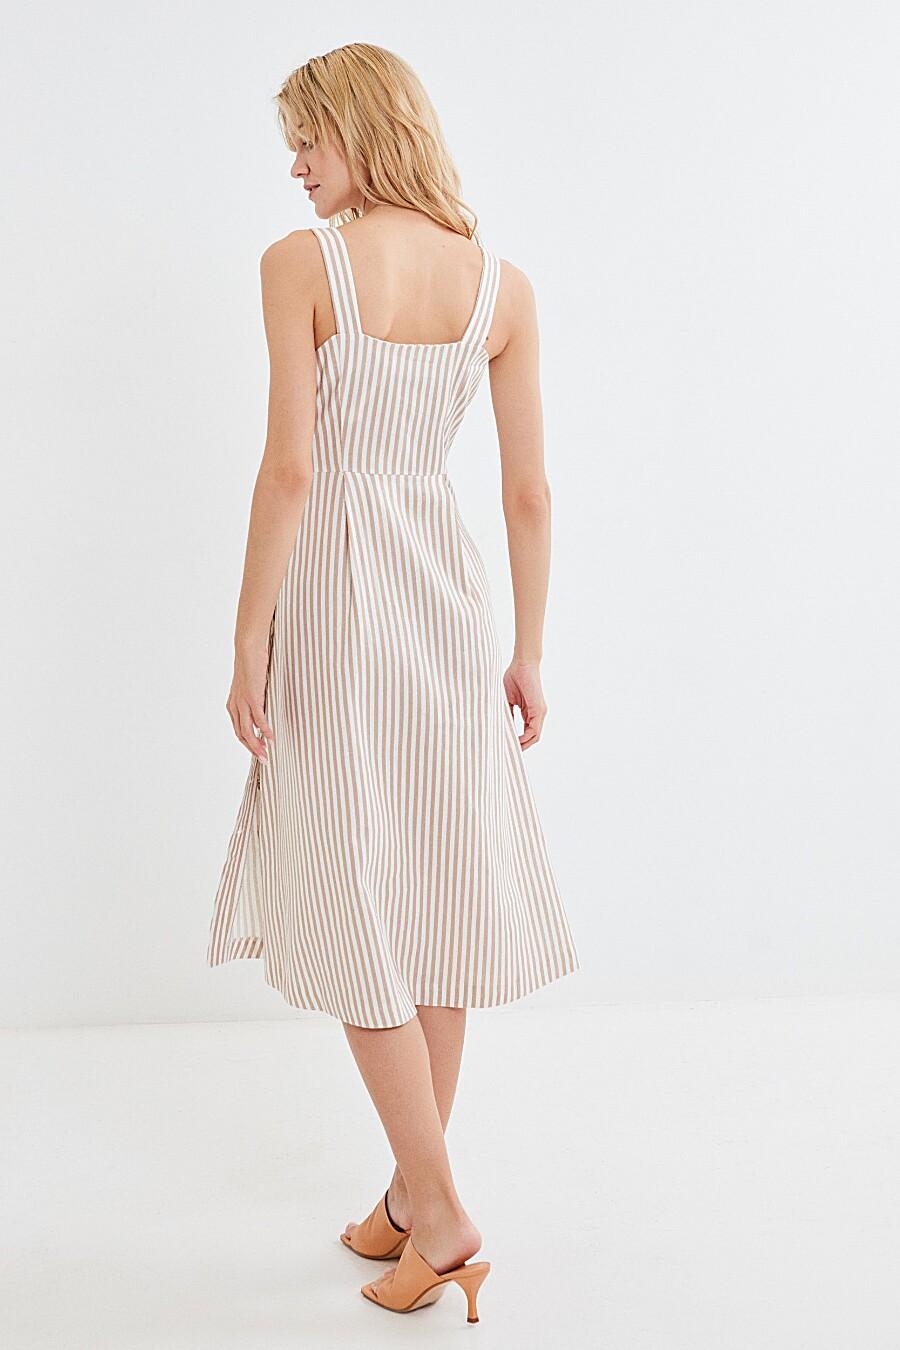 Сарафан ZARINA (205226), купить в Moyo.moda